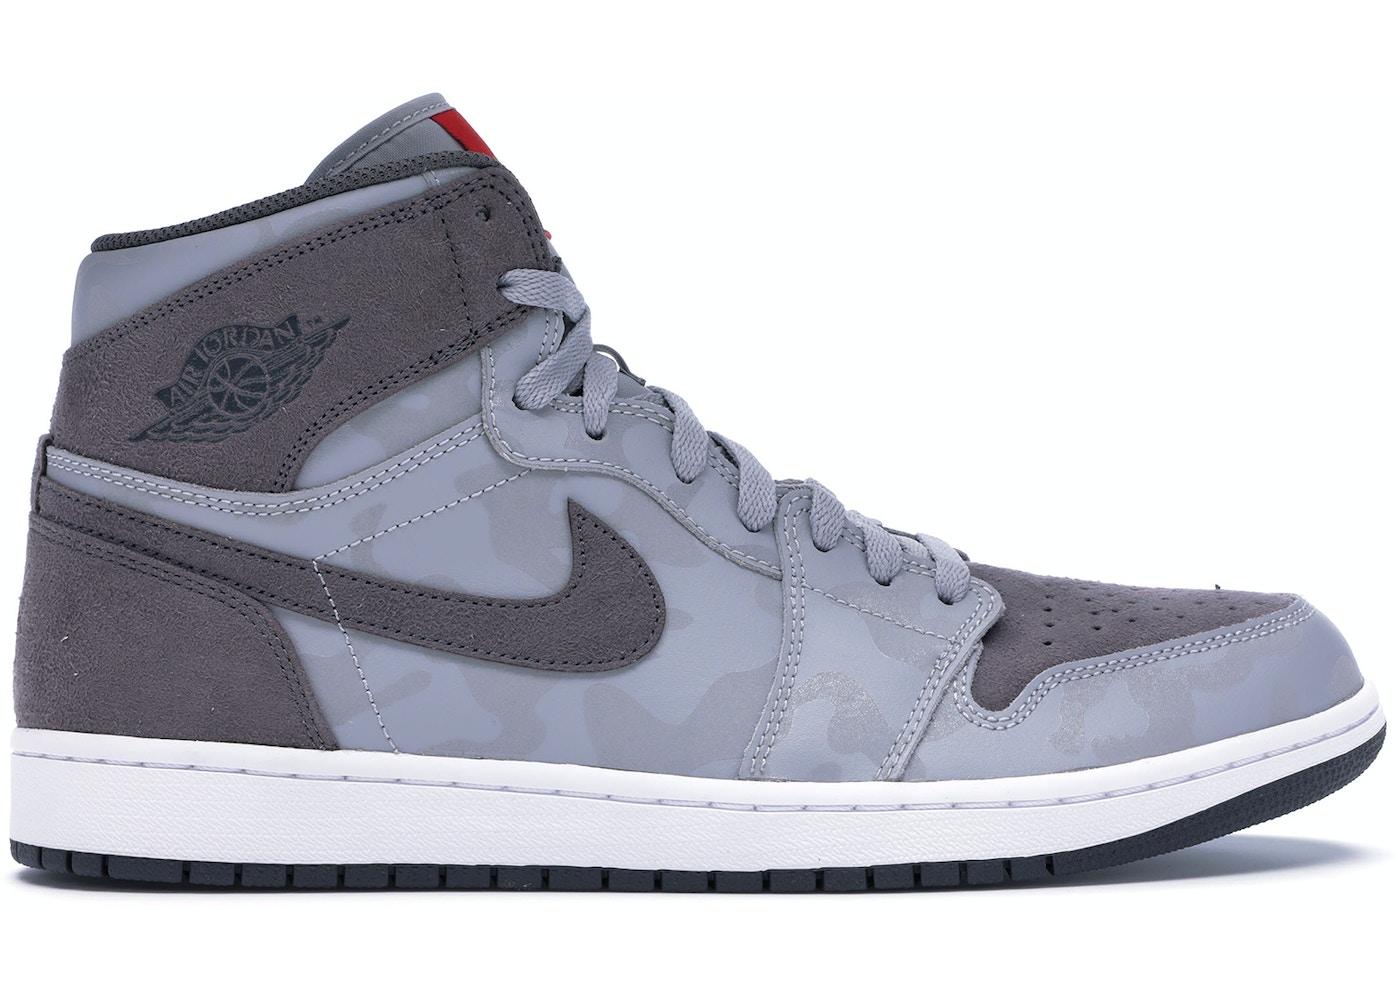 Buy Air Jordan 1 Size 17 Shoes   Deadstock Sneakers 547feb6c9